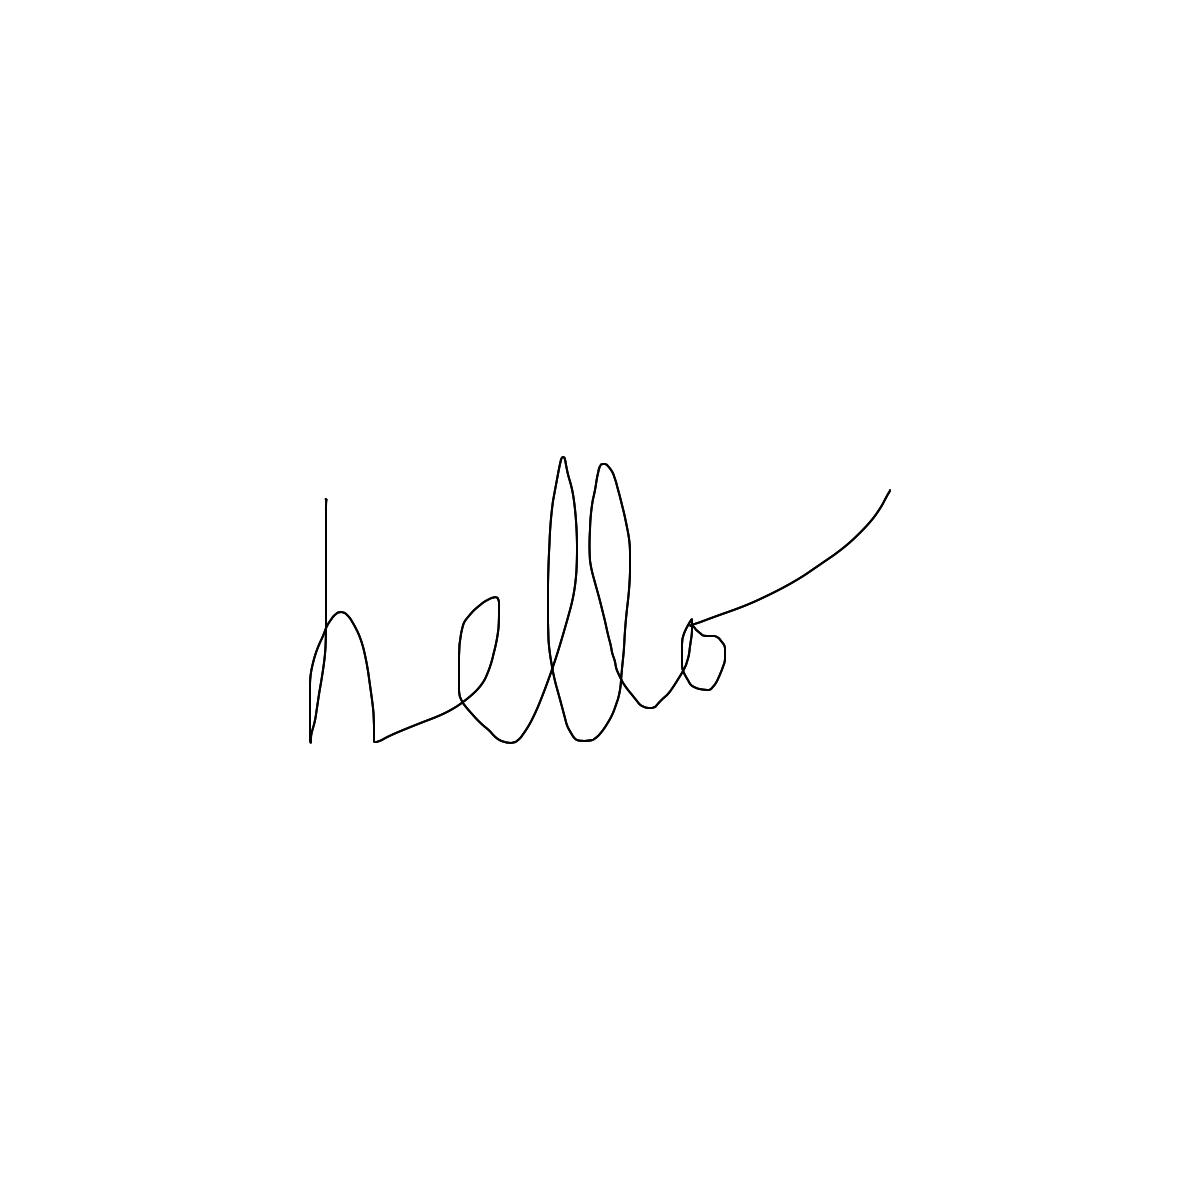 BAAAM drawing#307 lat:41.0203056335449200lng: -73.5975341796875000